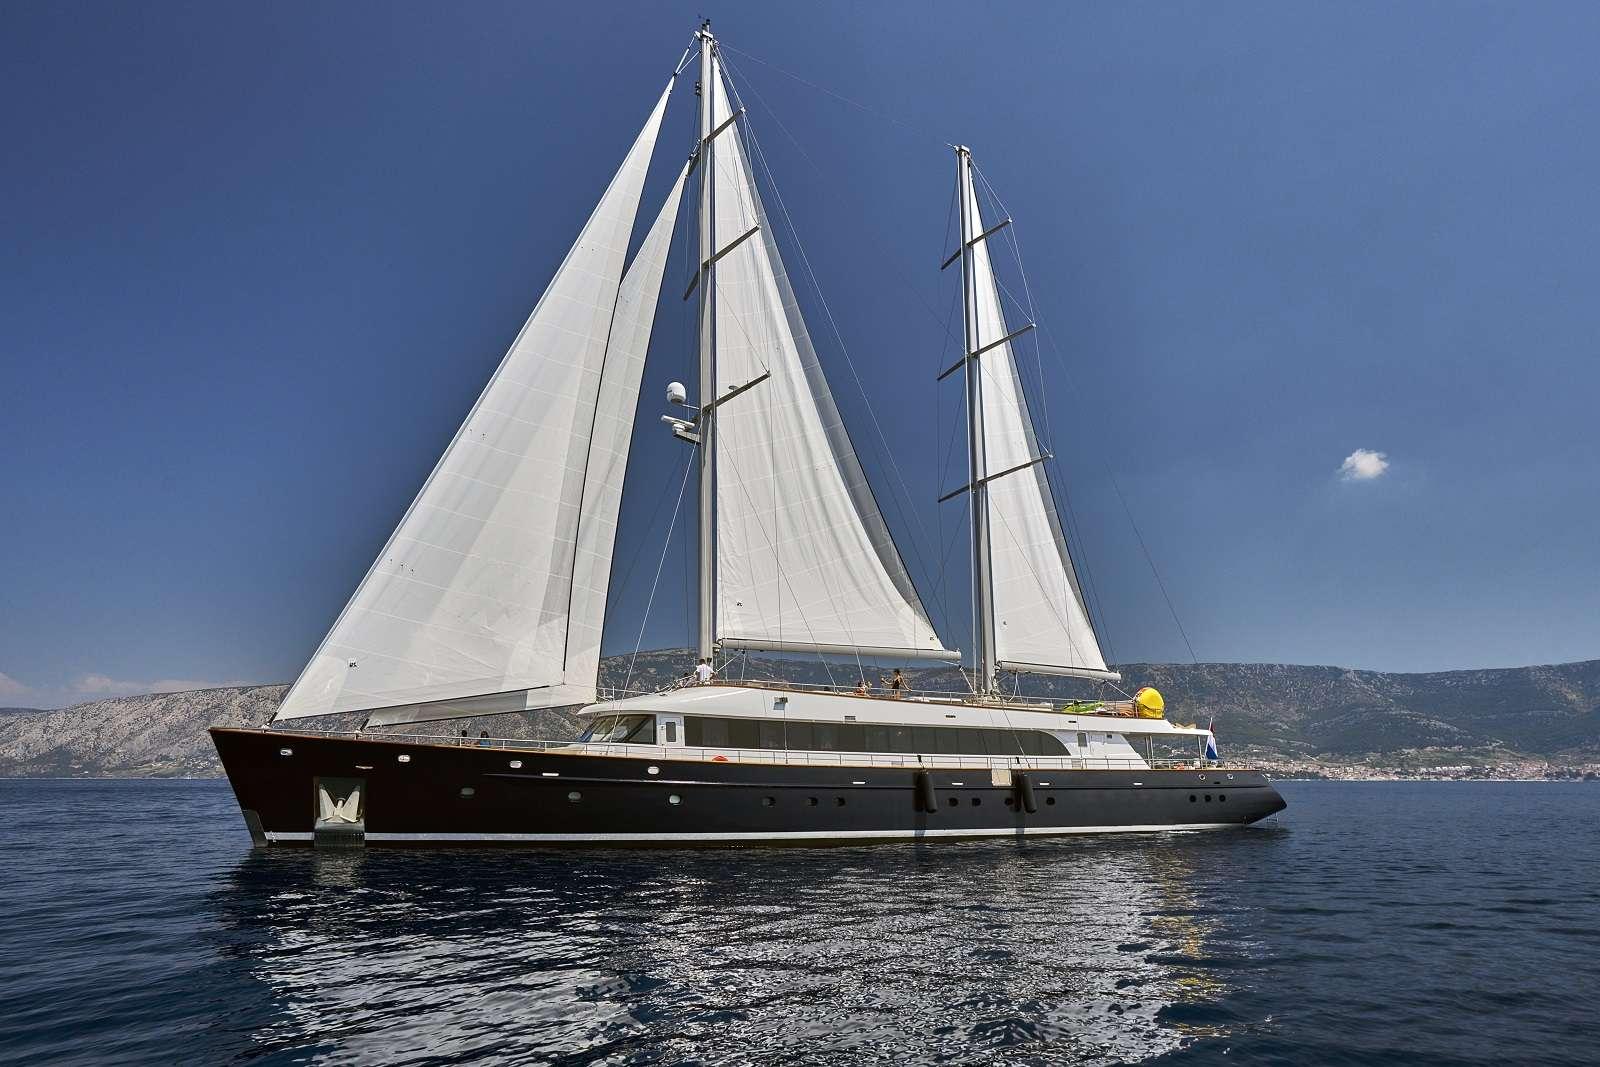 Main image of Dalmatino yacht